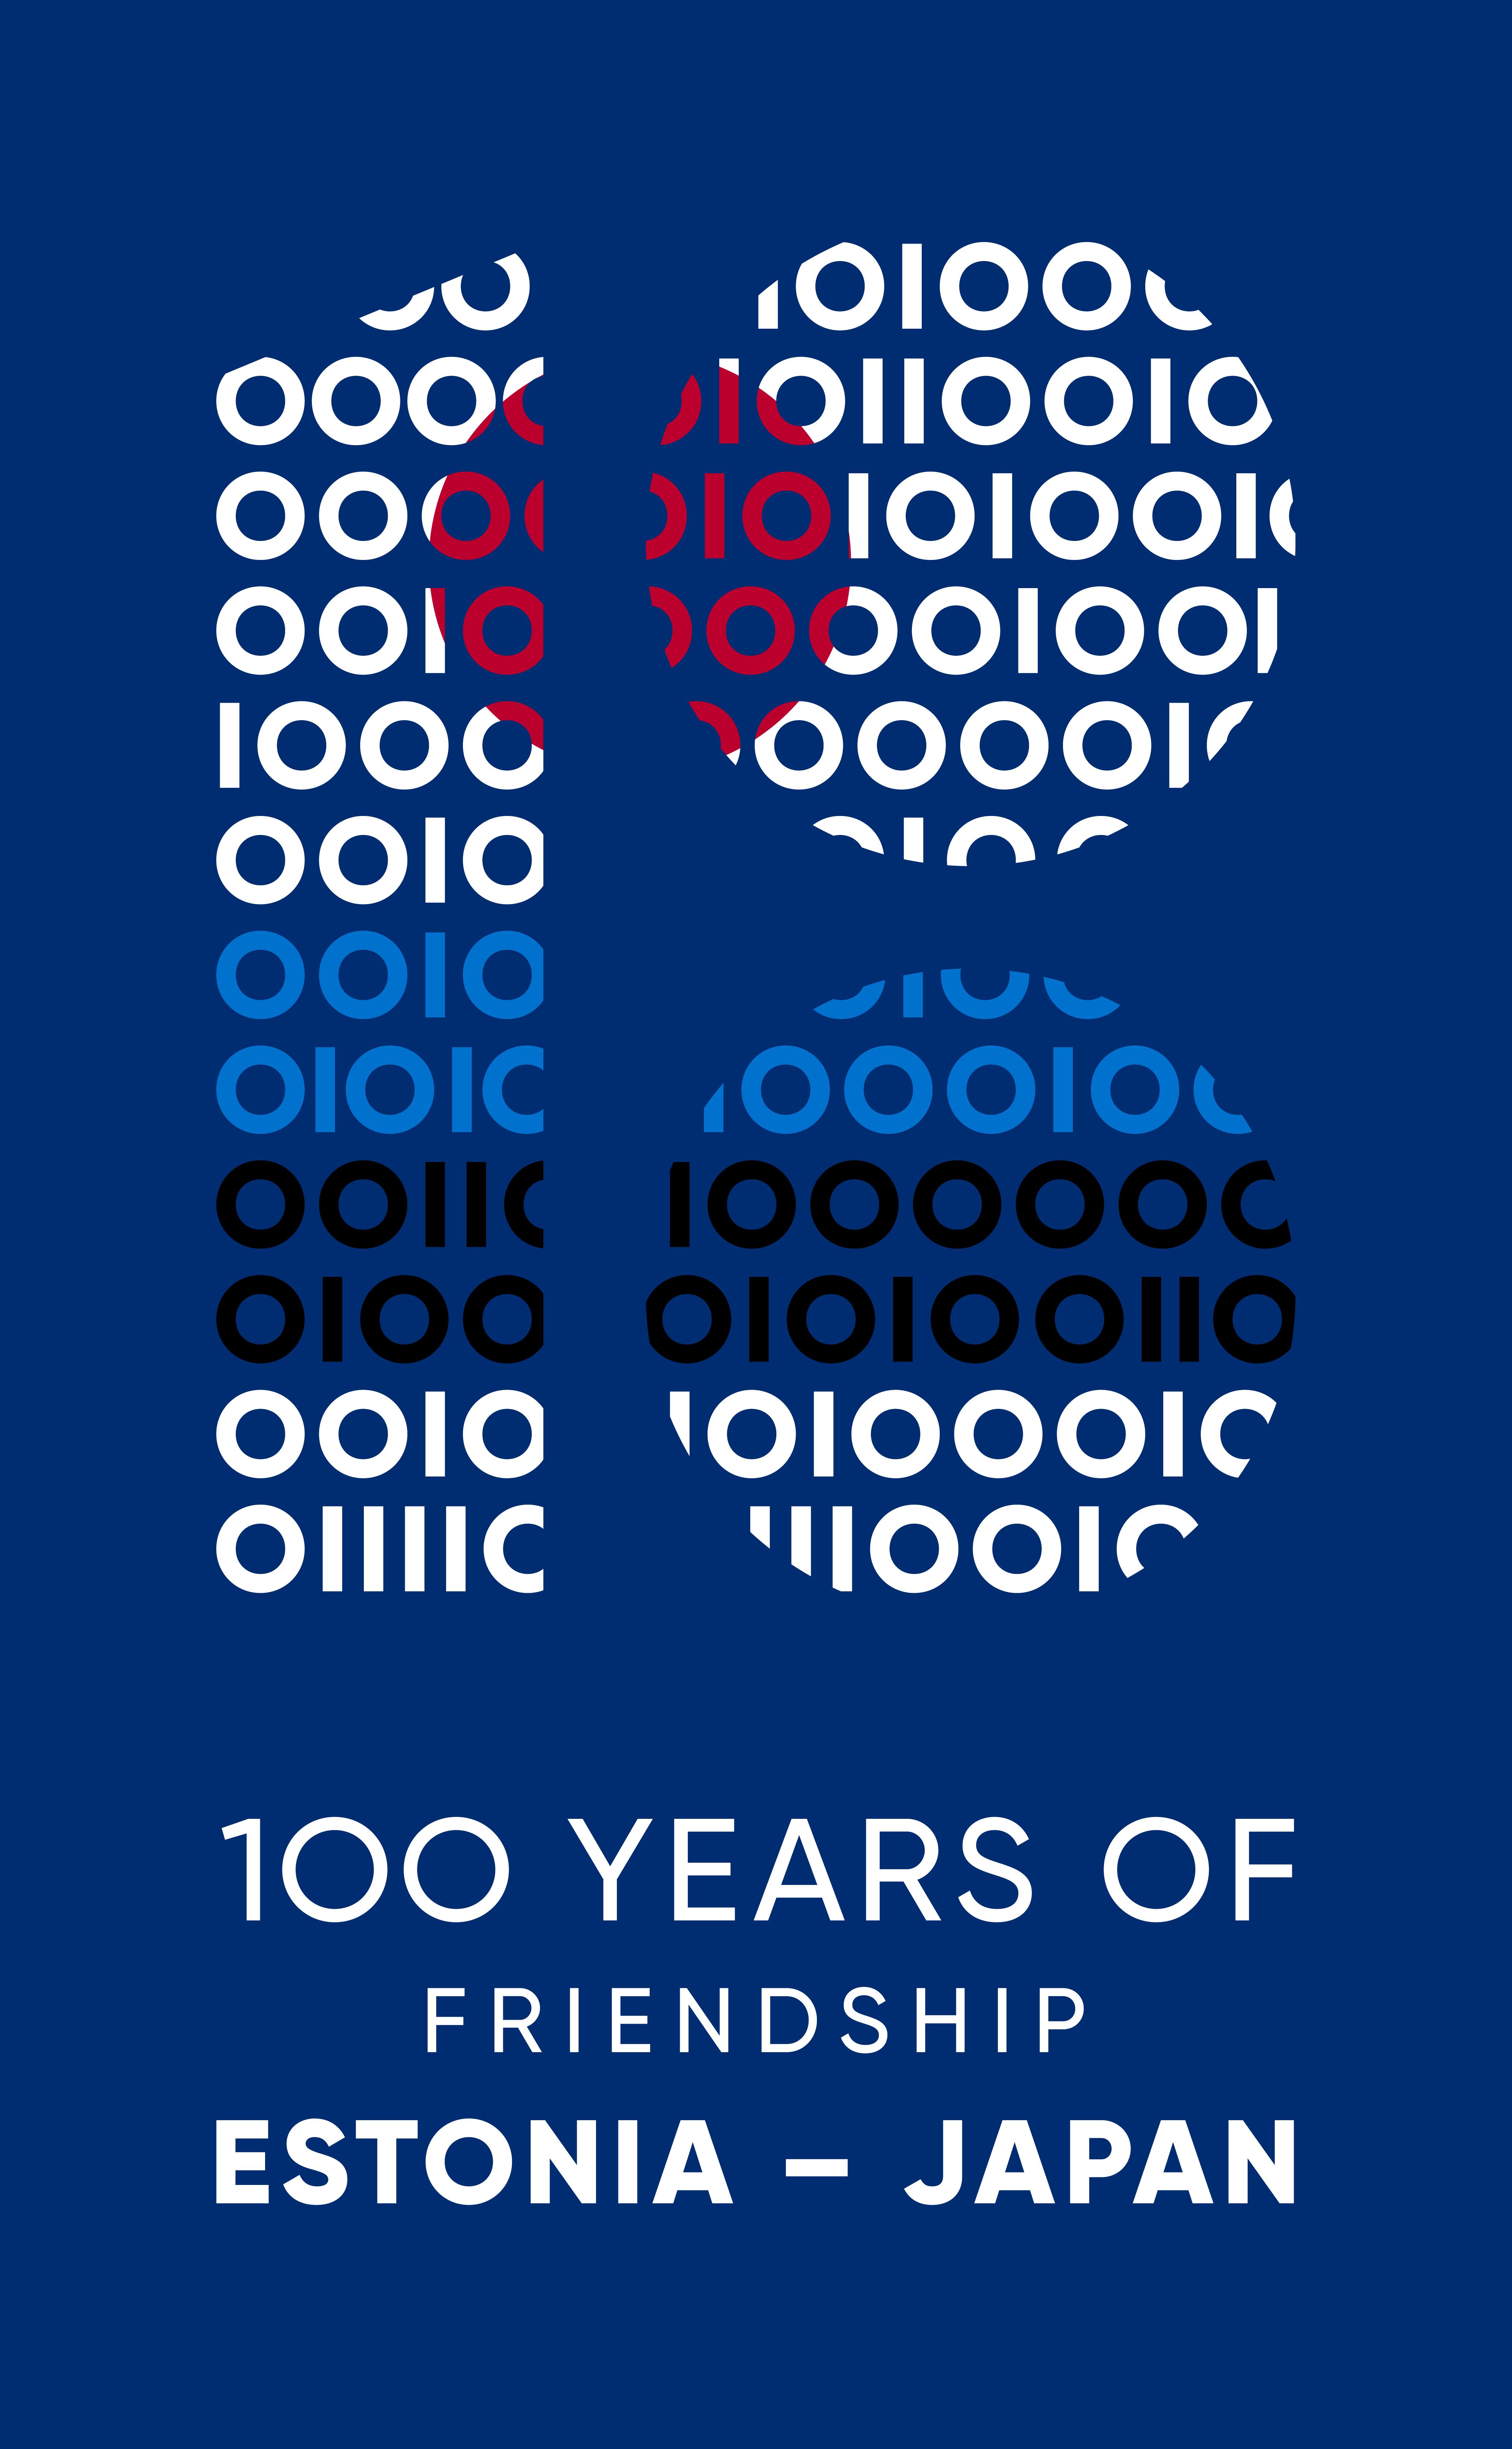 100 years of relations between Estonia and Japan